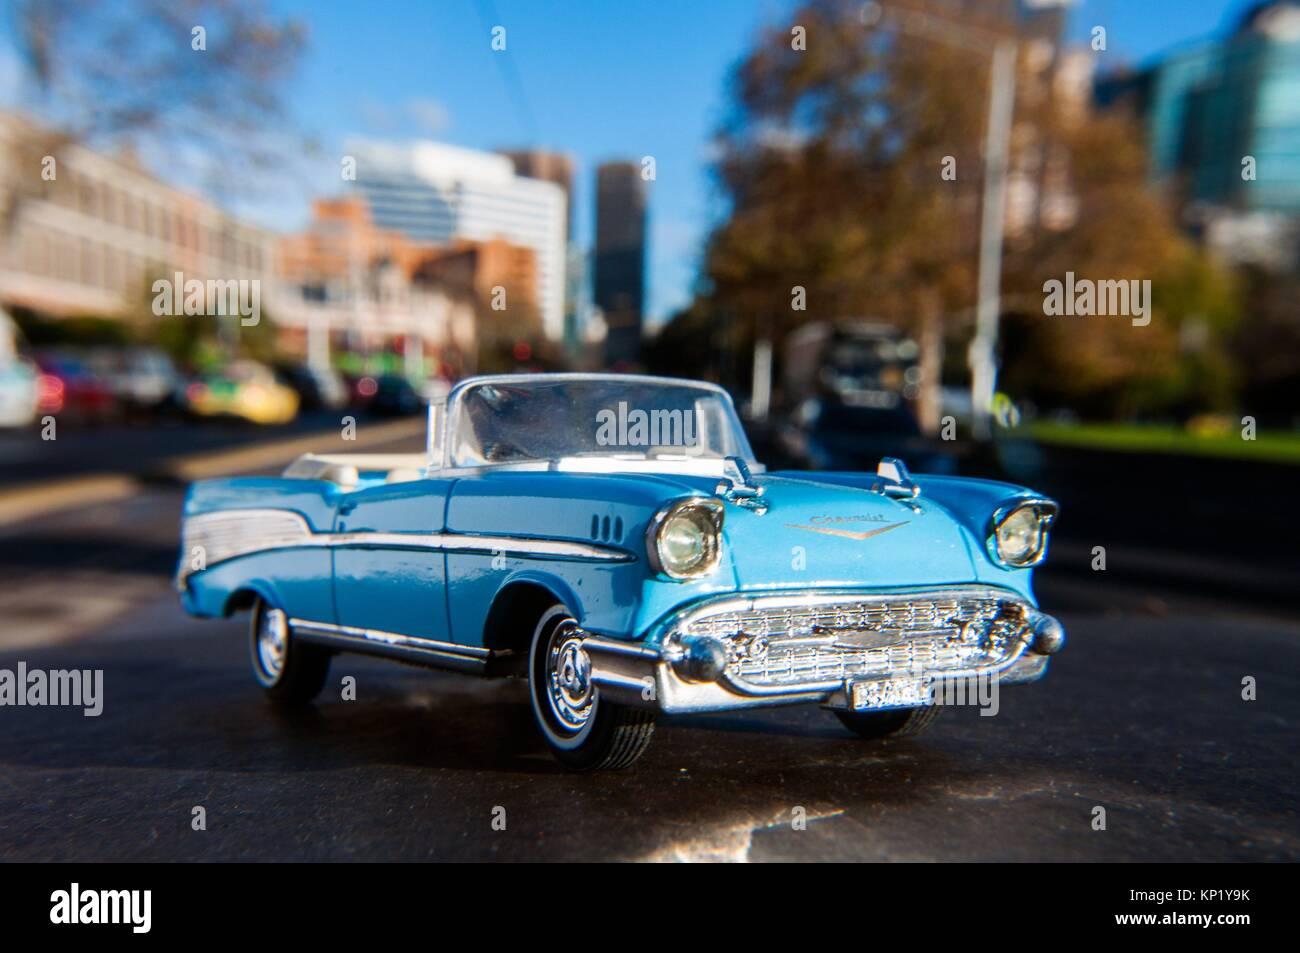 Model 1957 Chevrolet Bel Air sedan car on location in Melbourne, Australia - Stock Image